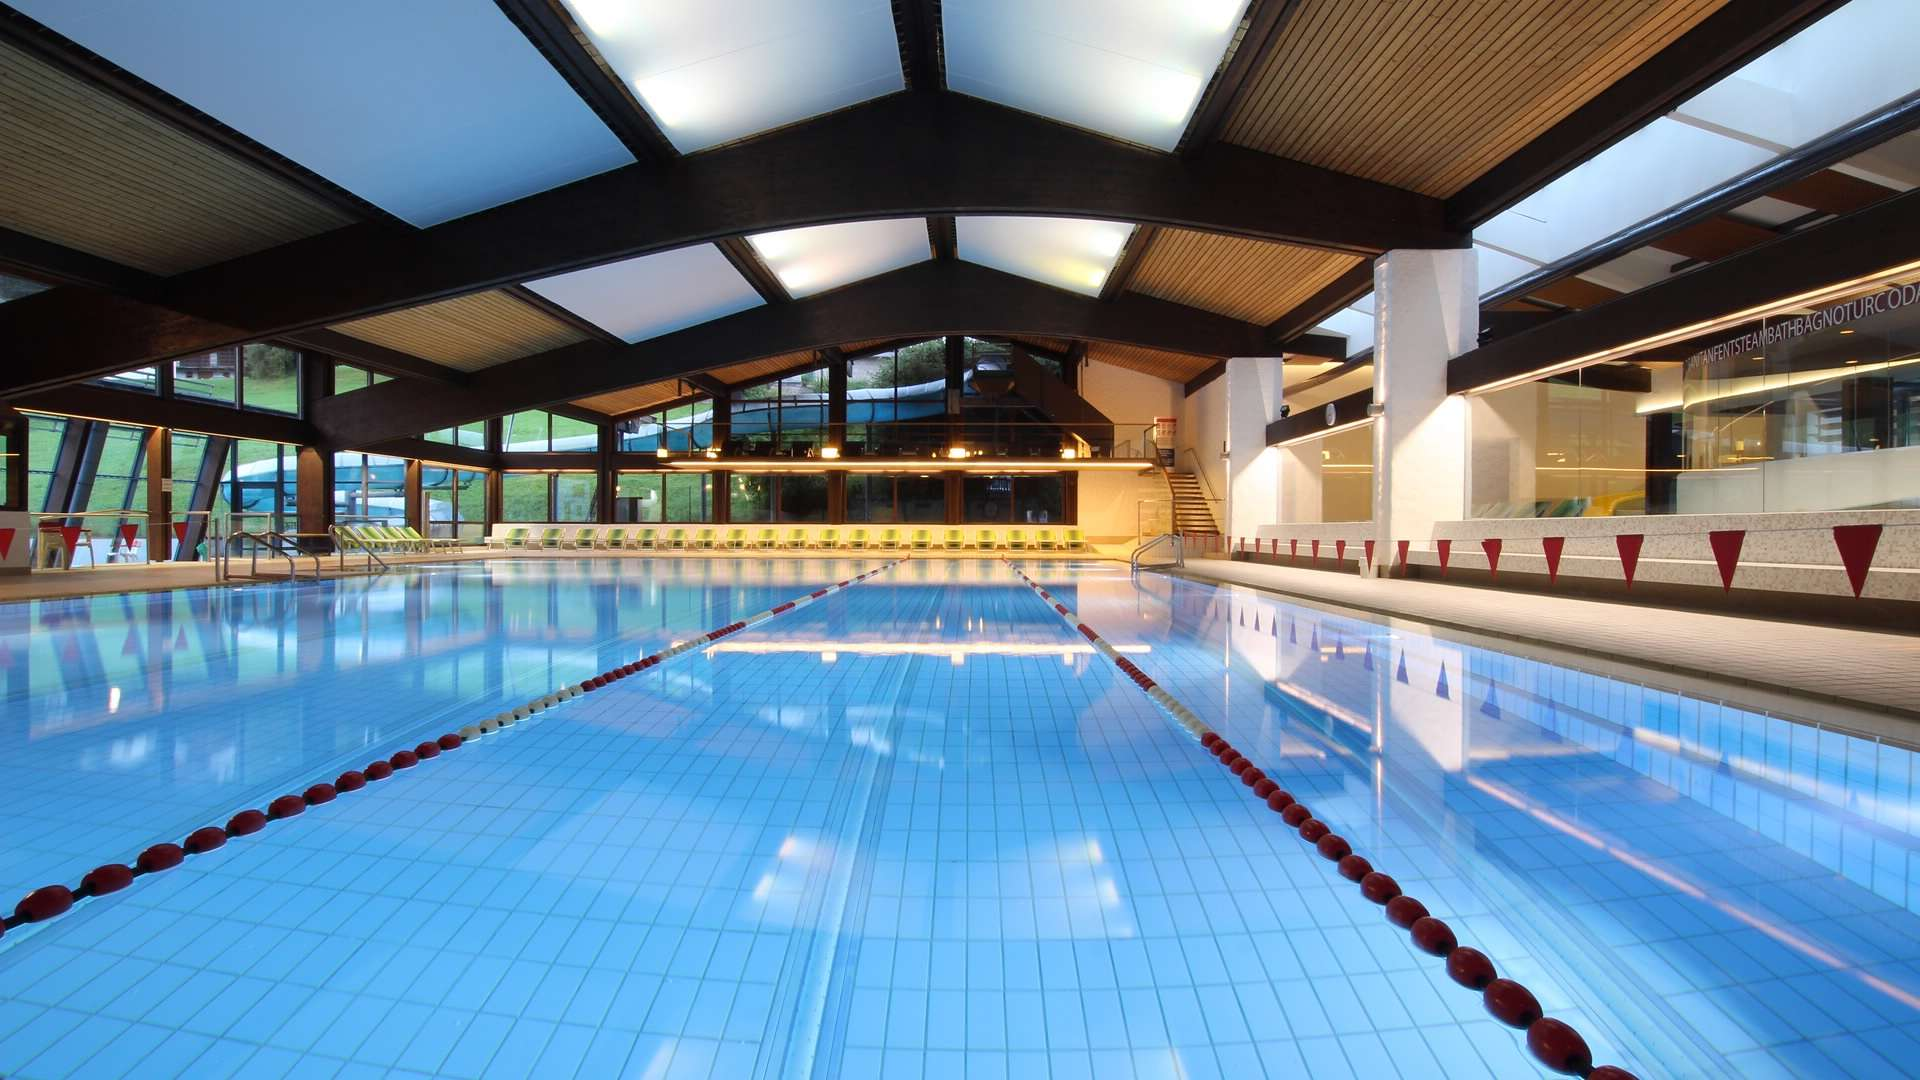 Why Your Pool Smells Like A Pool Aquatic Council Llc